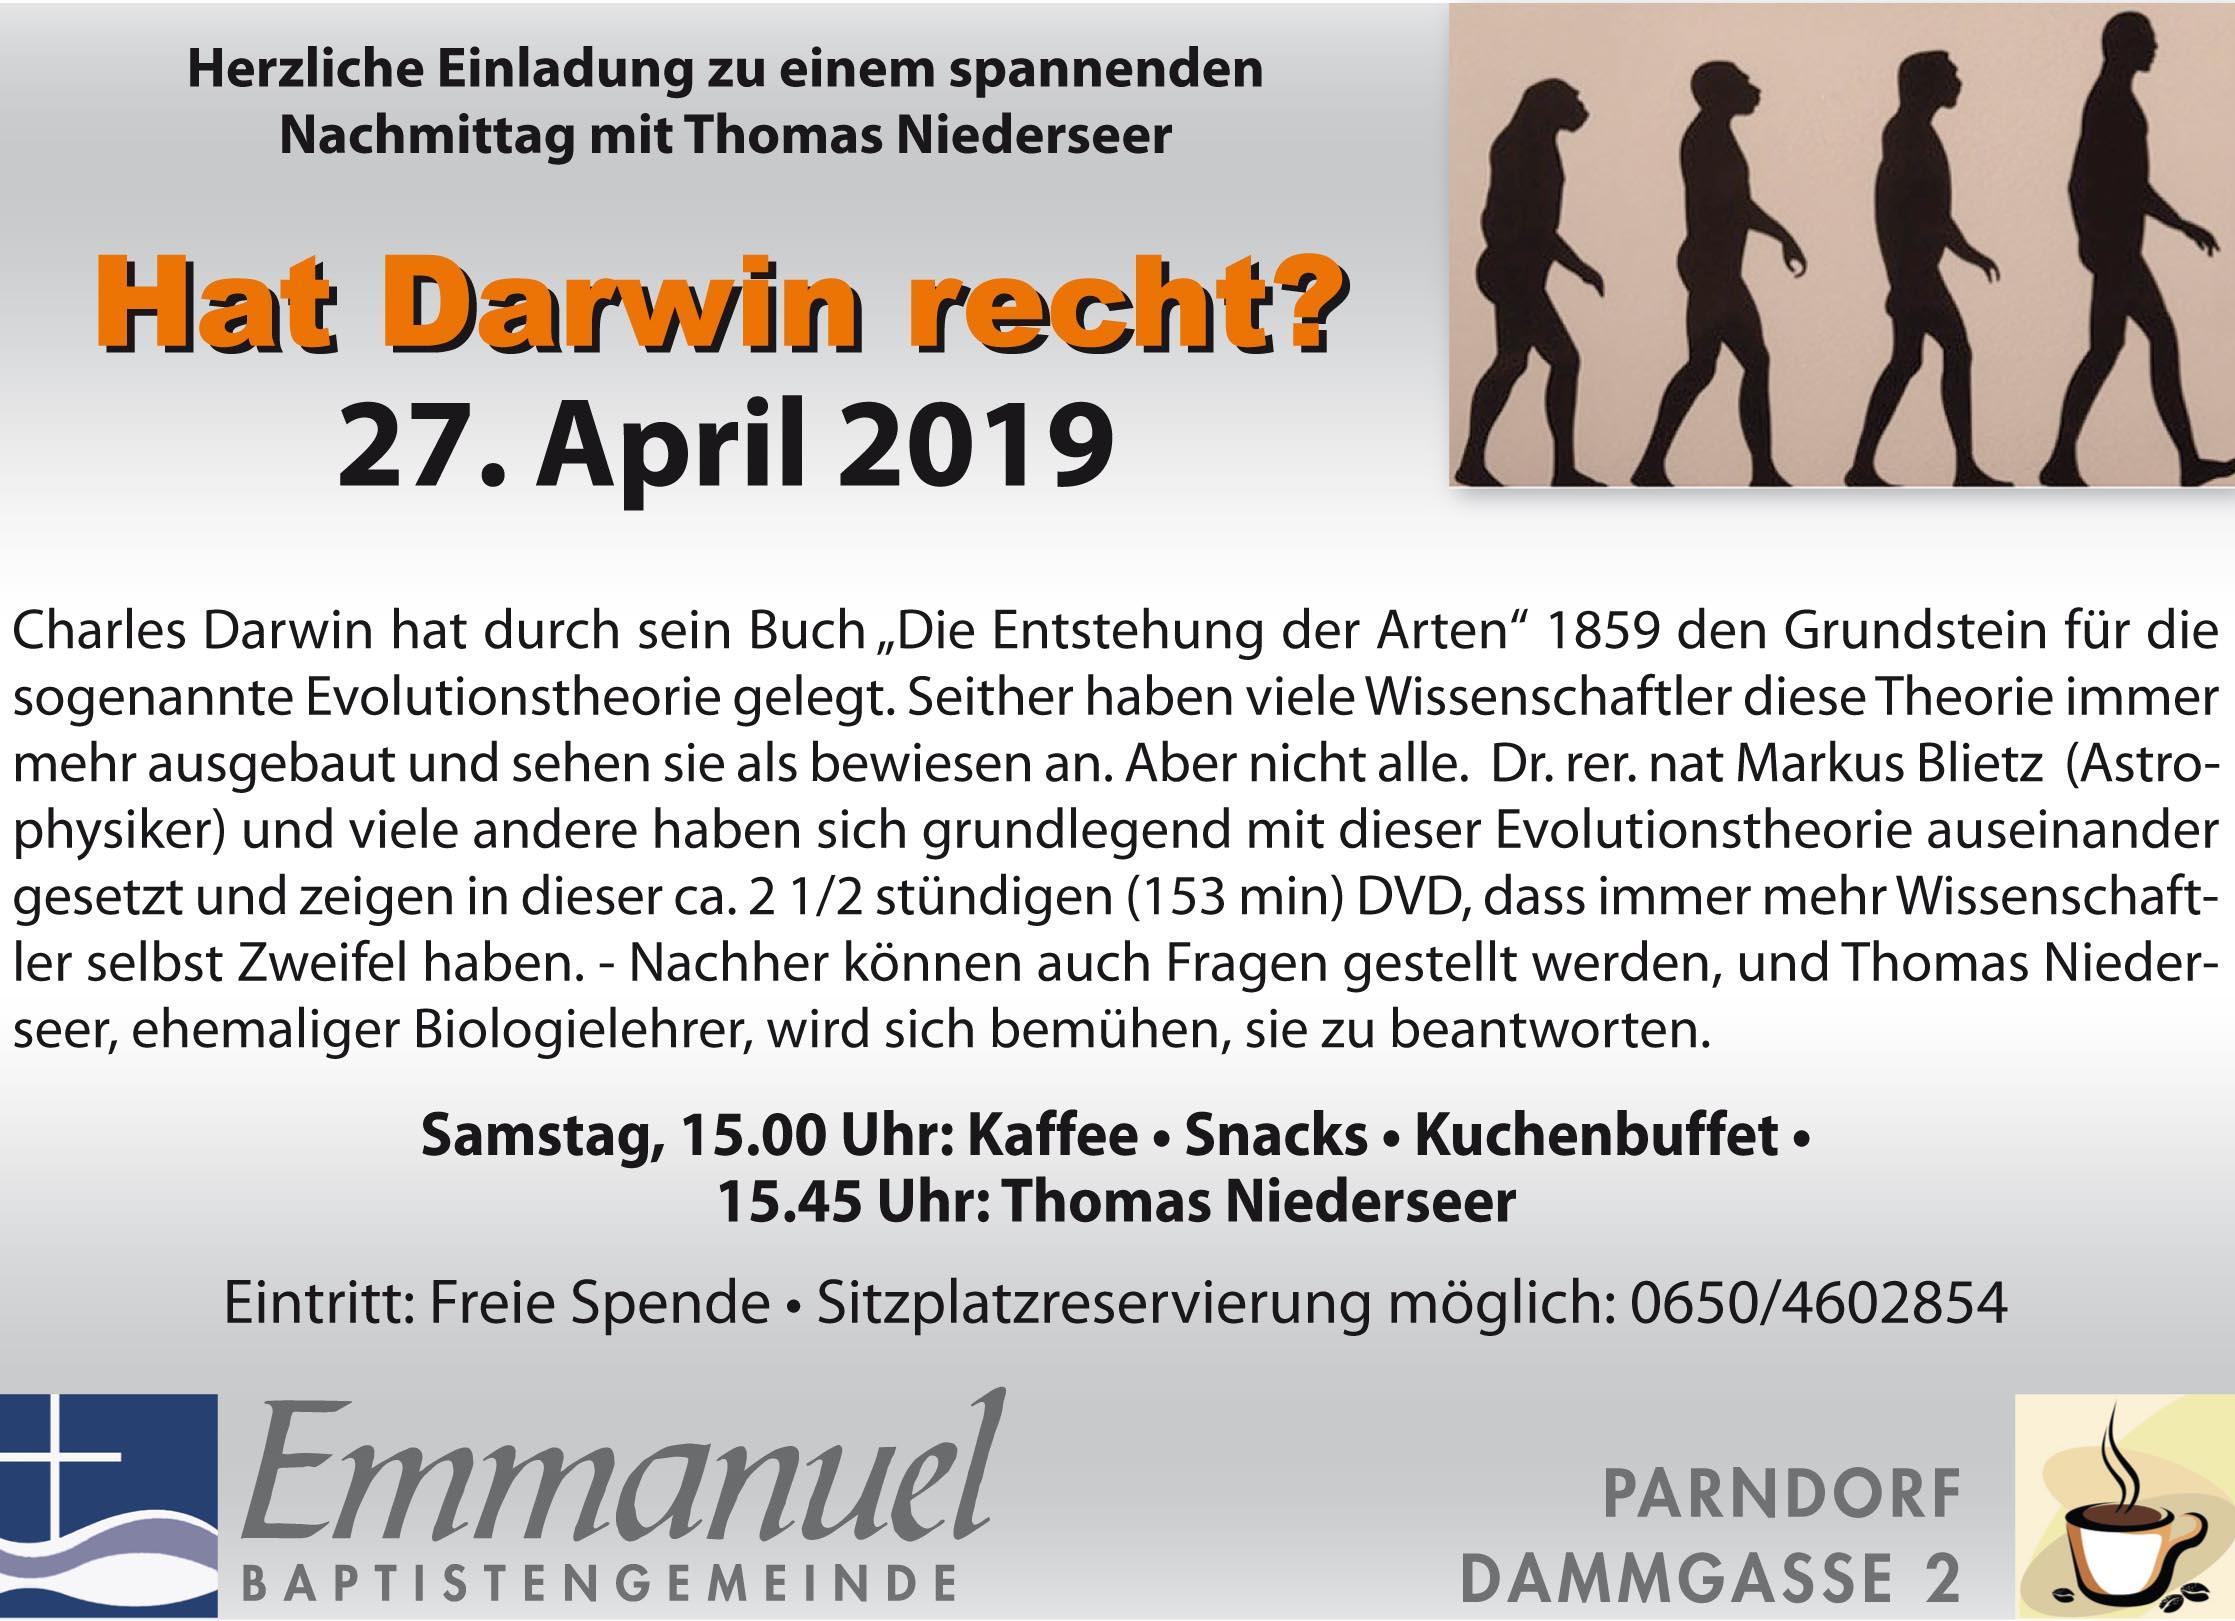 Hat Darwin Recht?